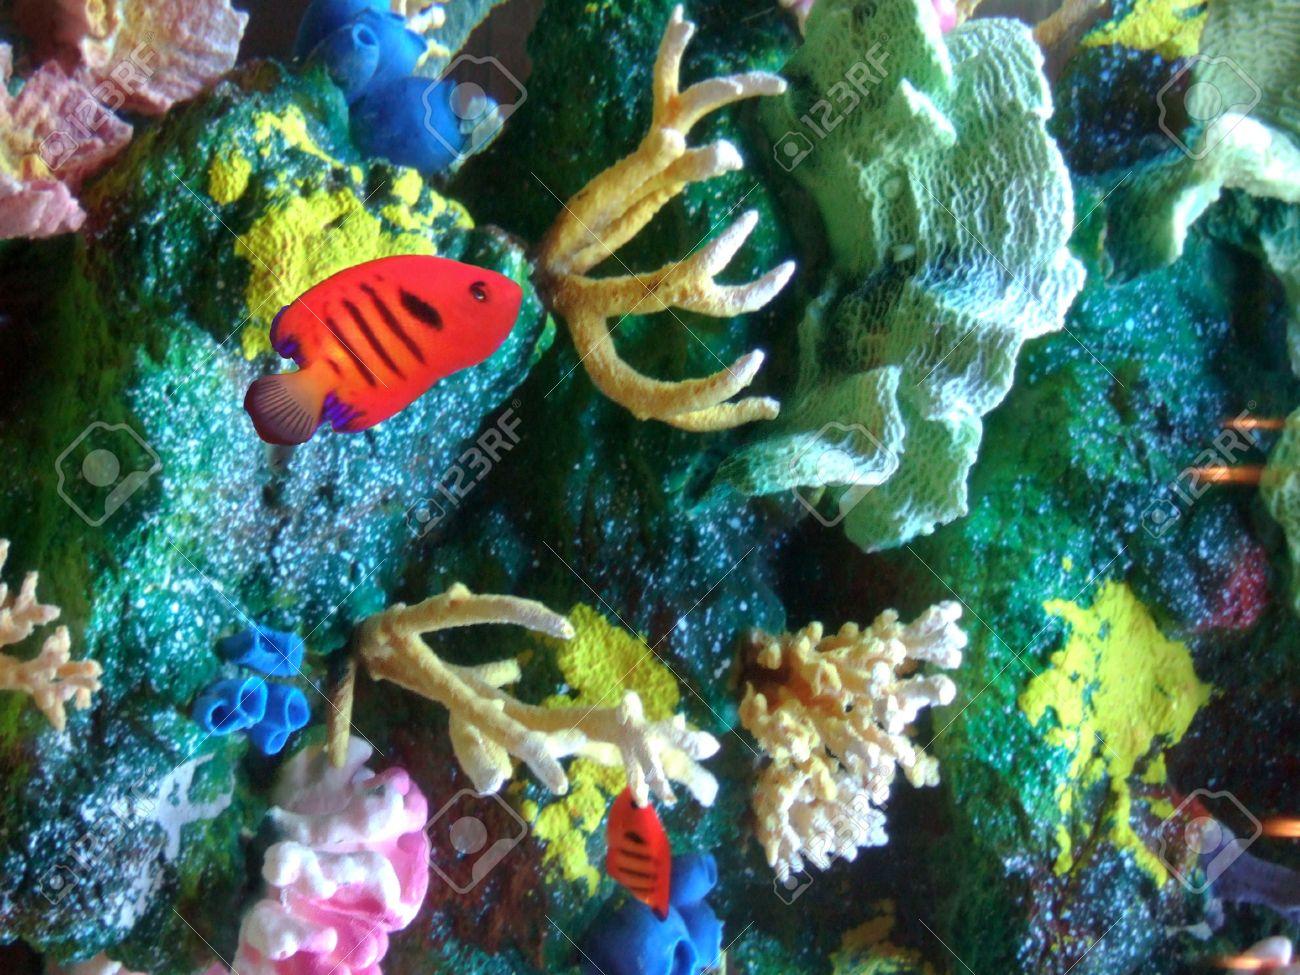 Aquarium Containing Bright Red Fish, Colorful Coral Rocks And ...